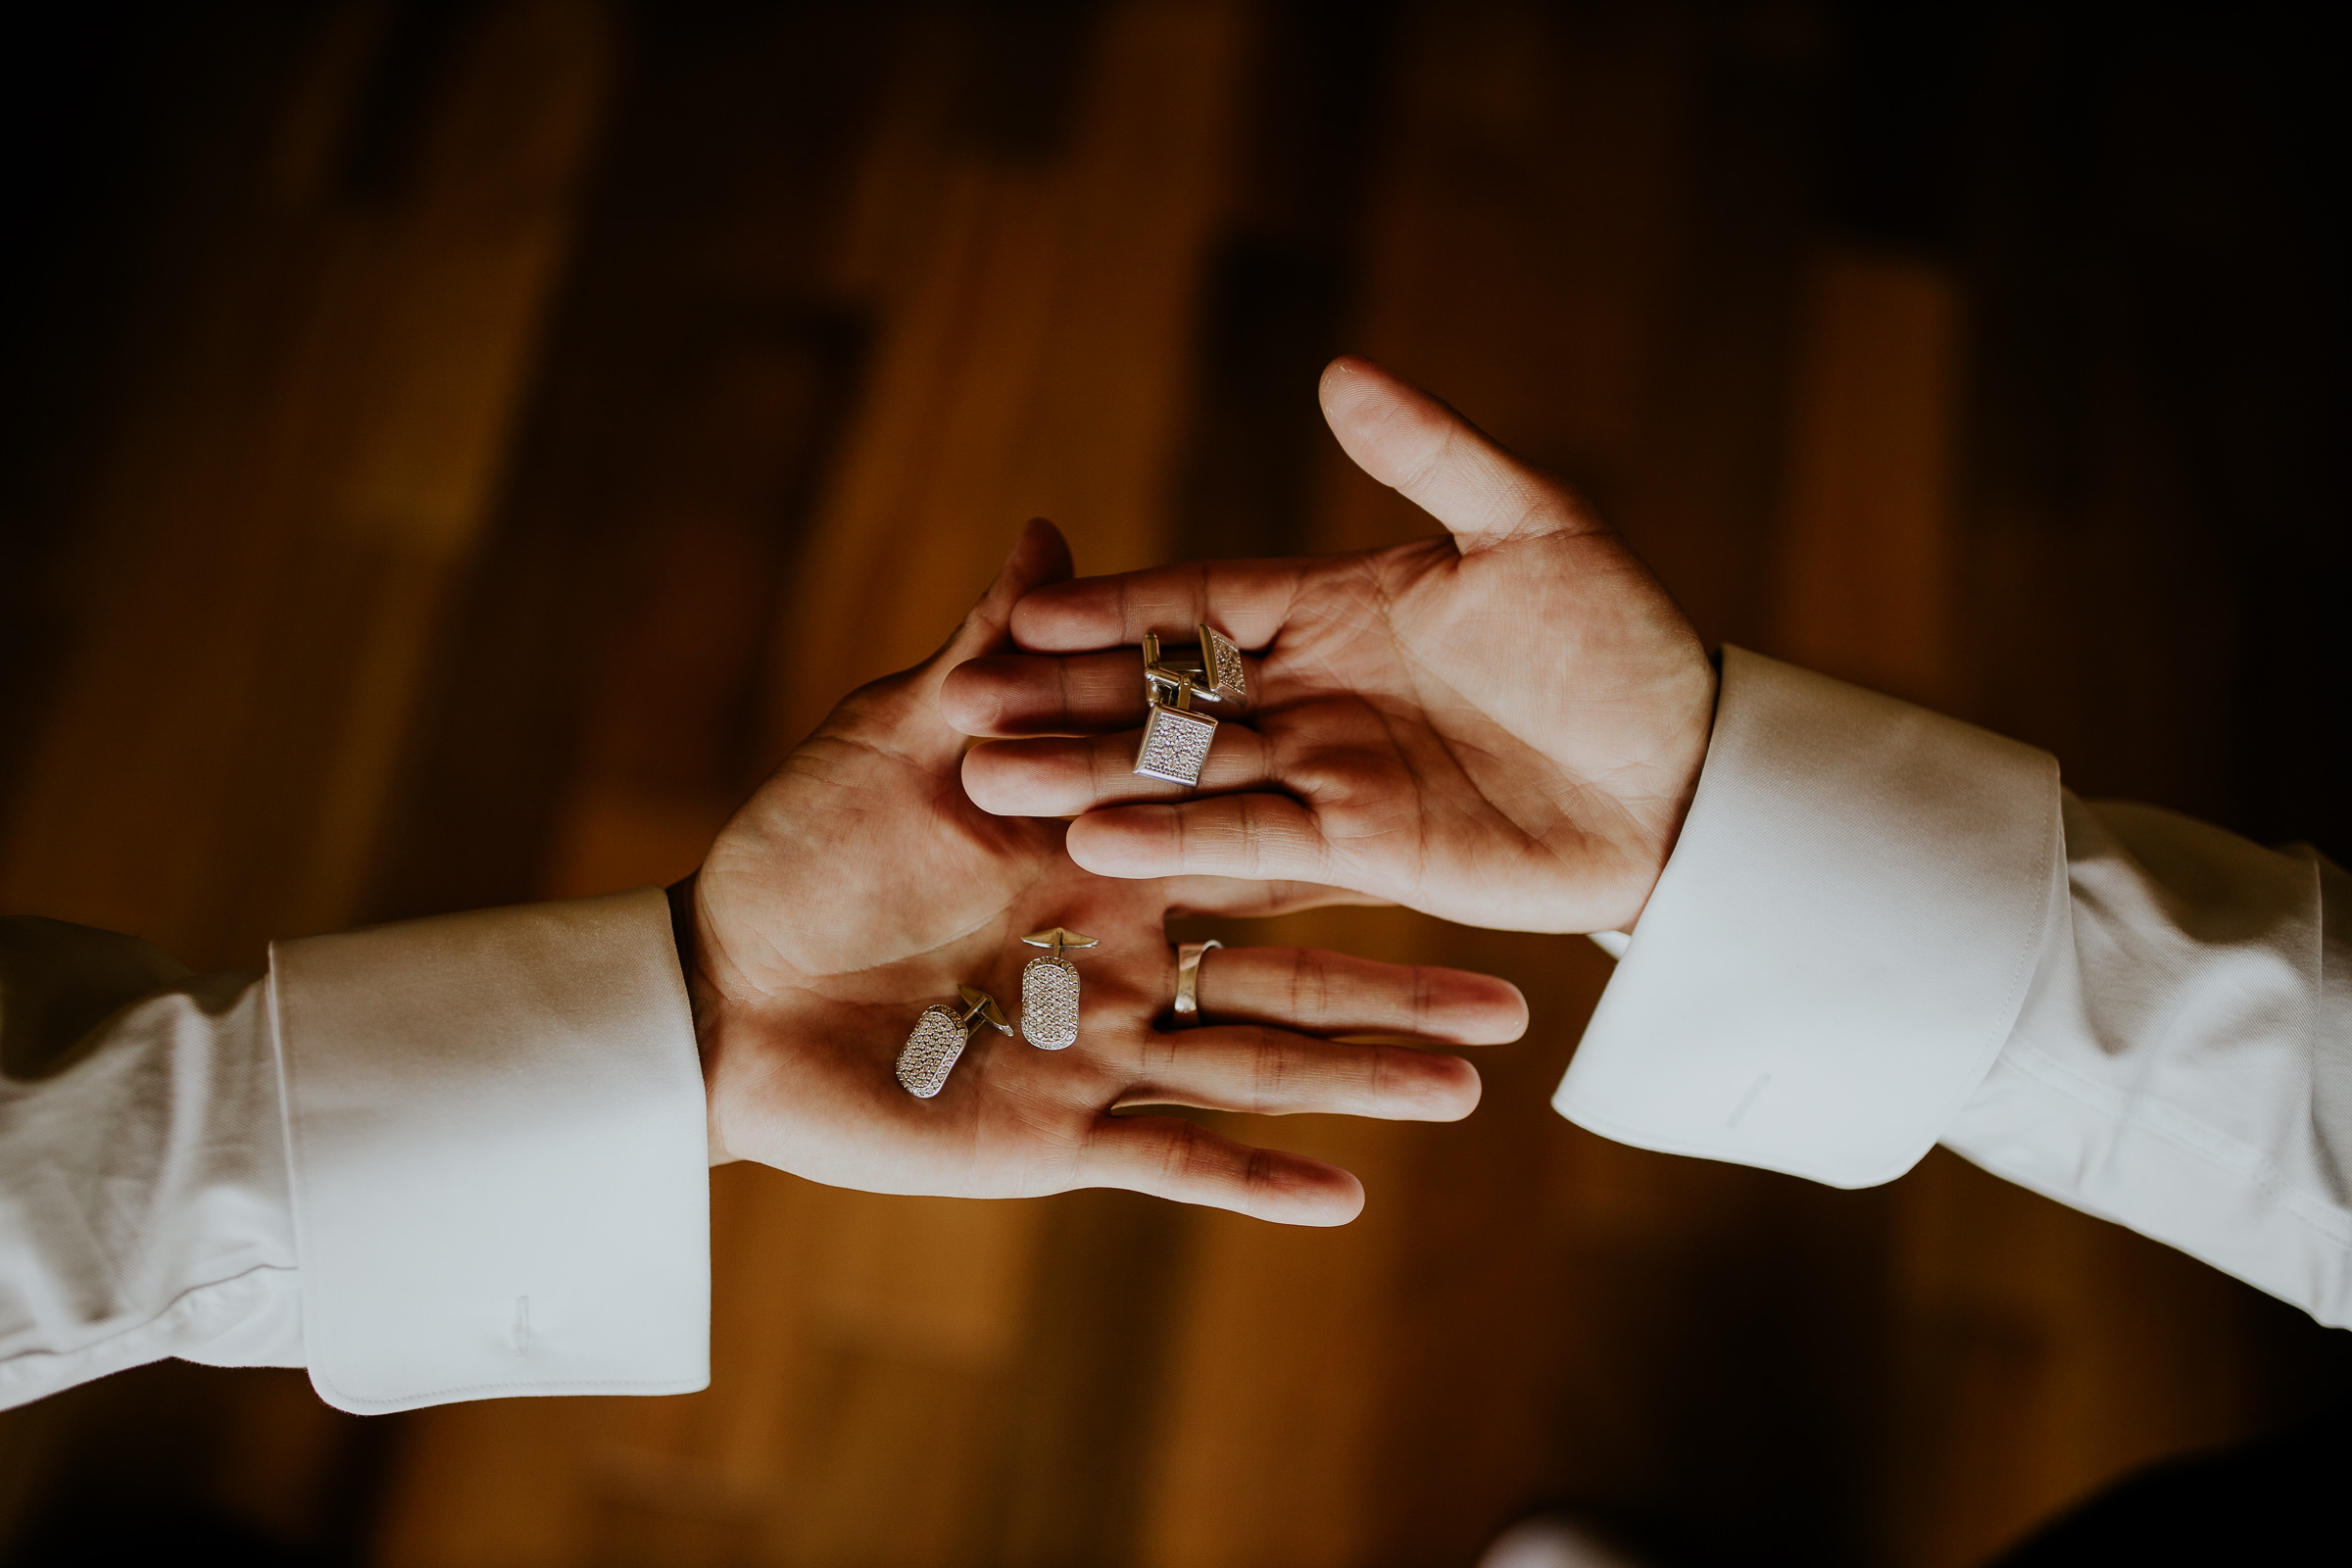 hands with wedding accessories